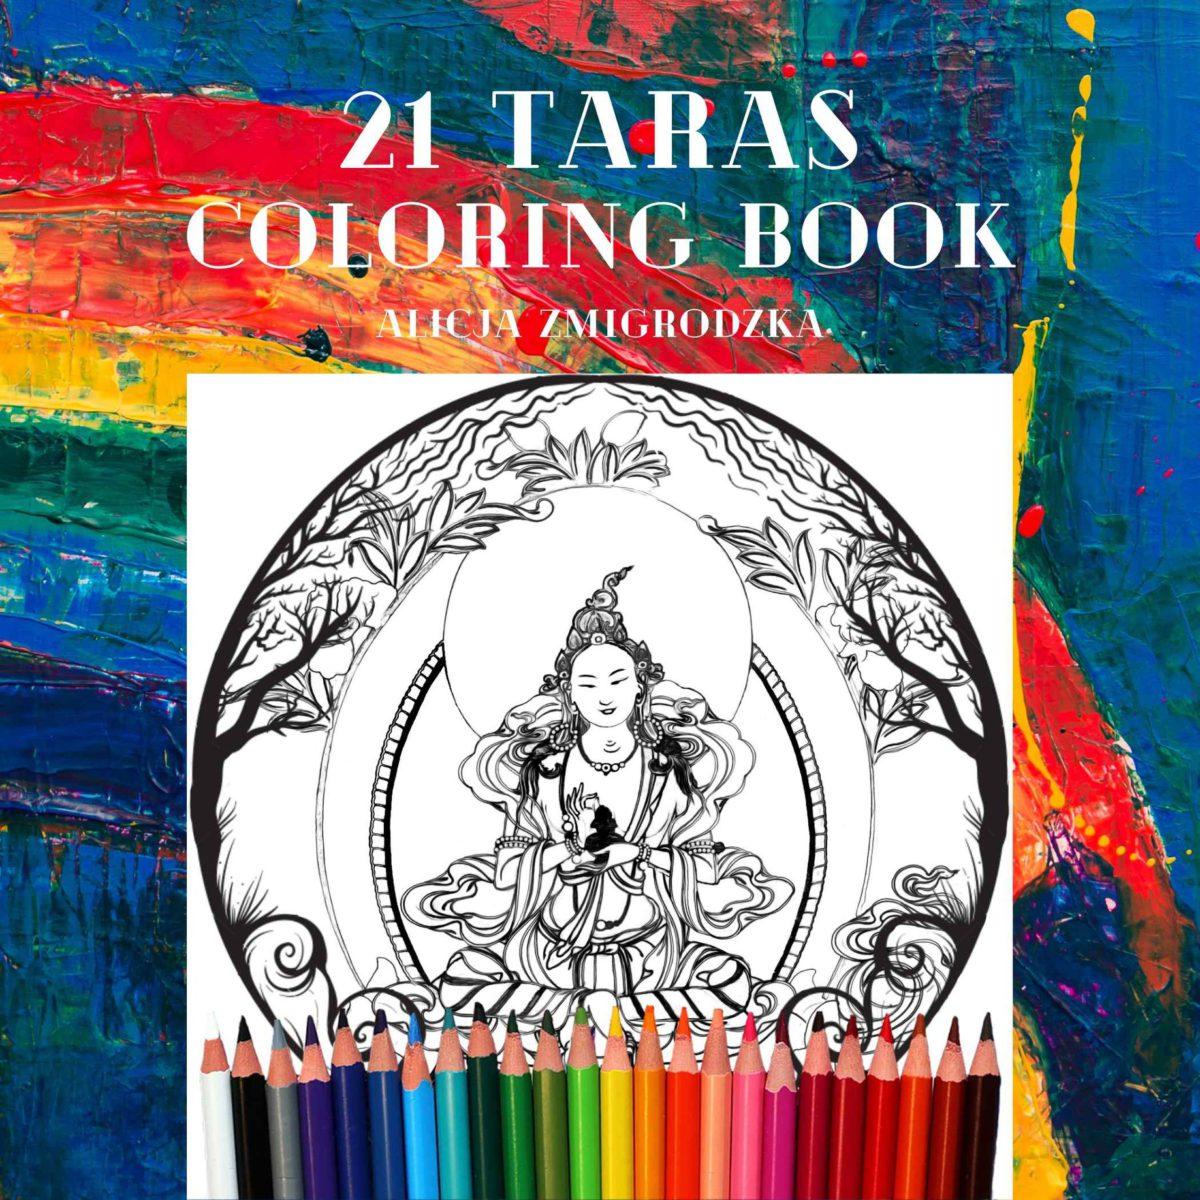 21 Taras Coloring Book